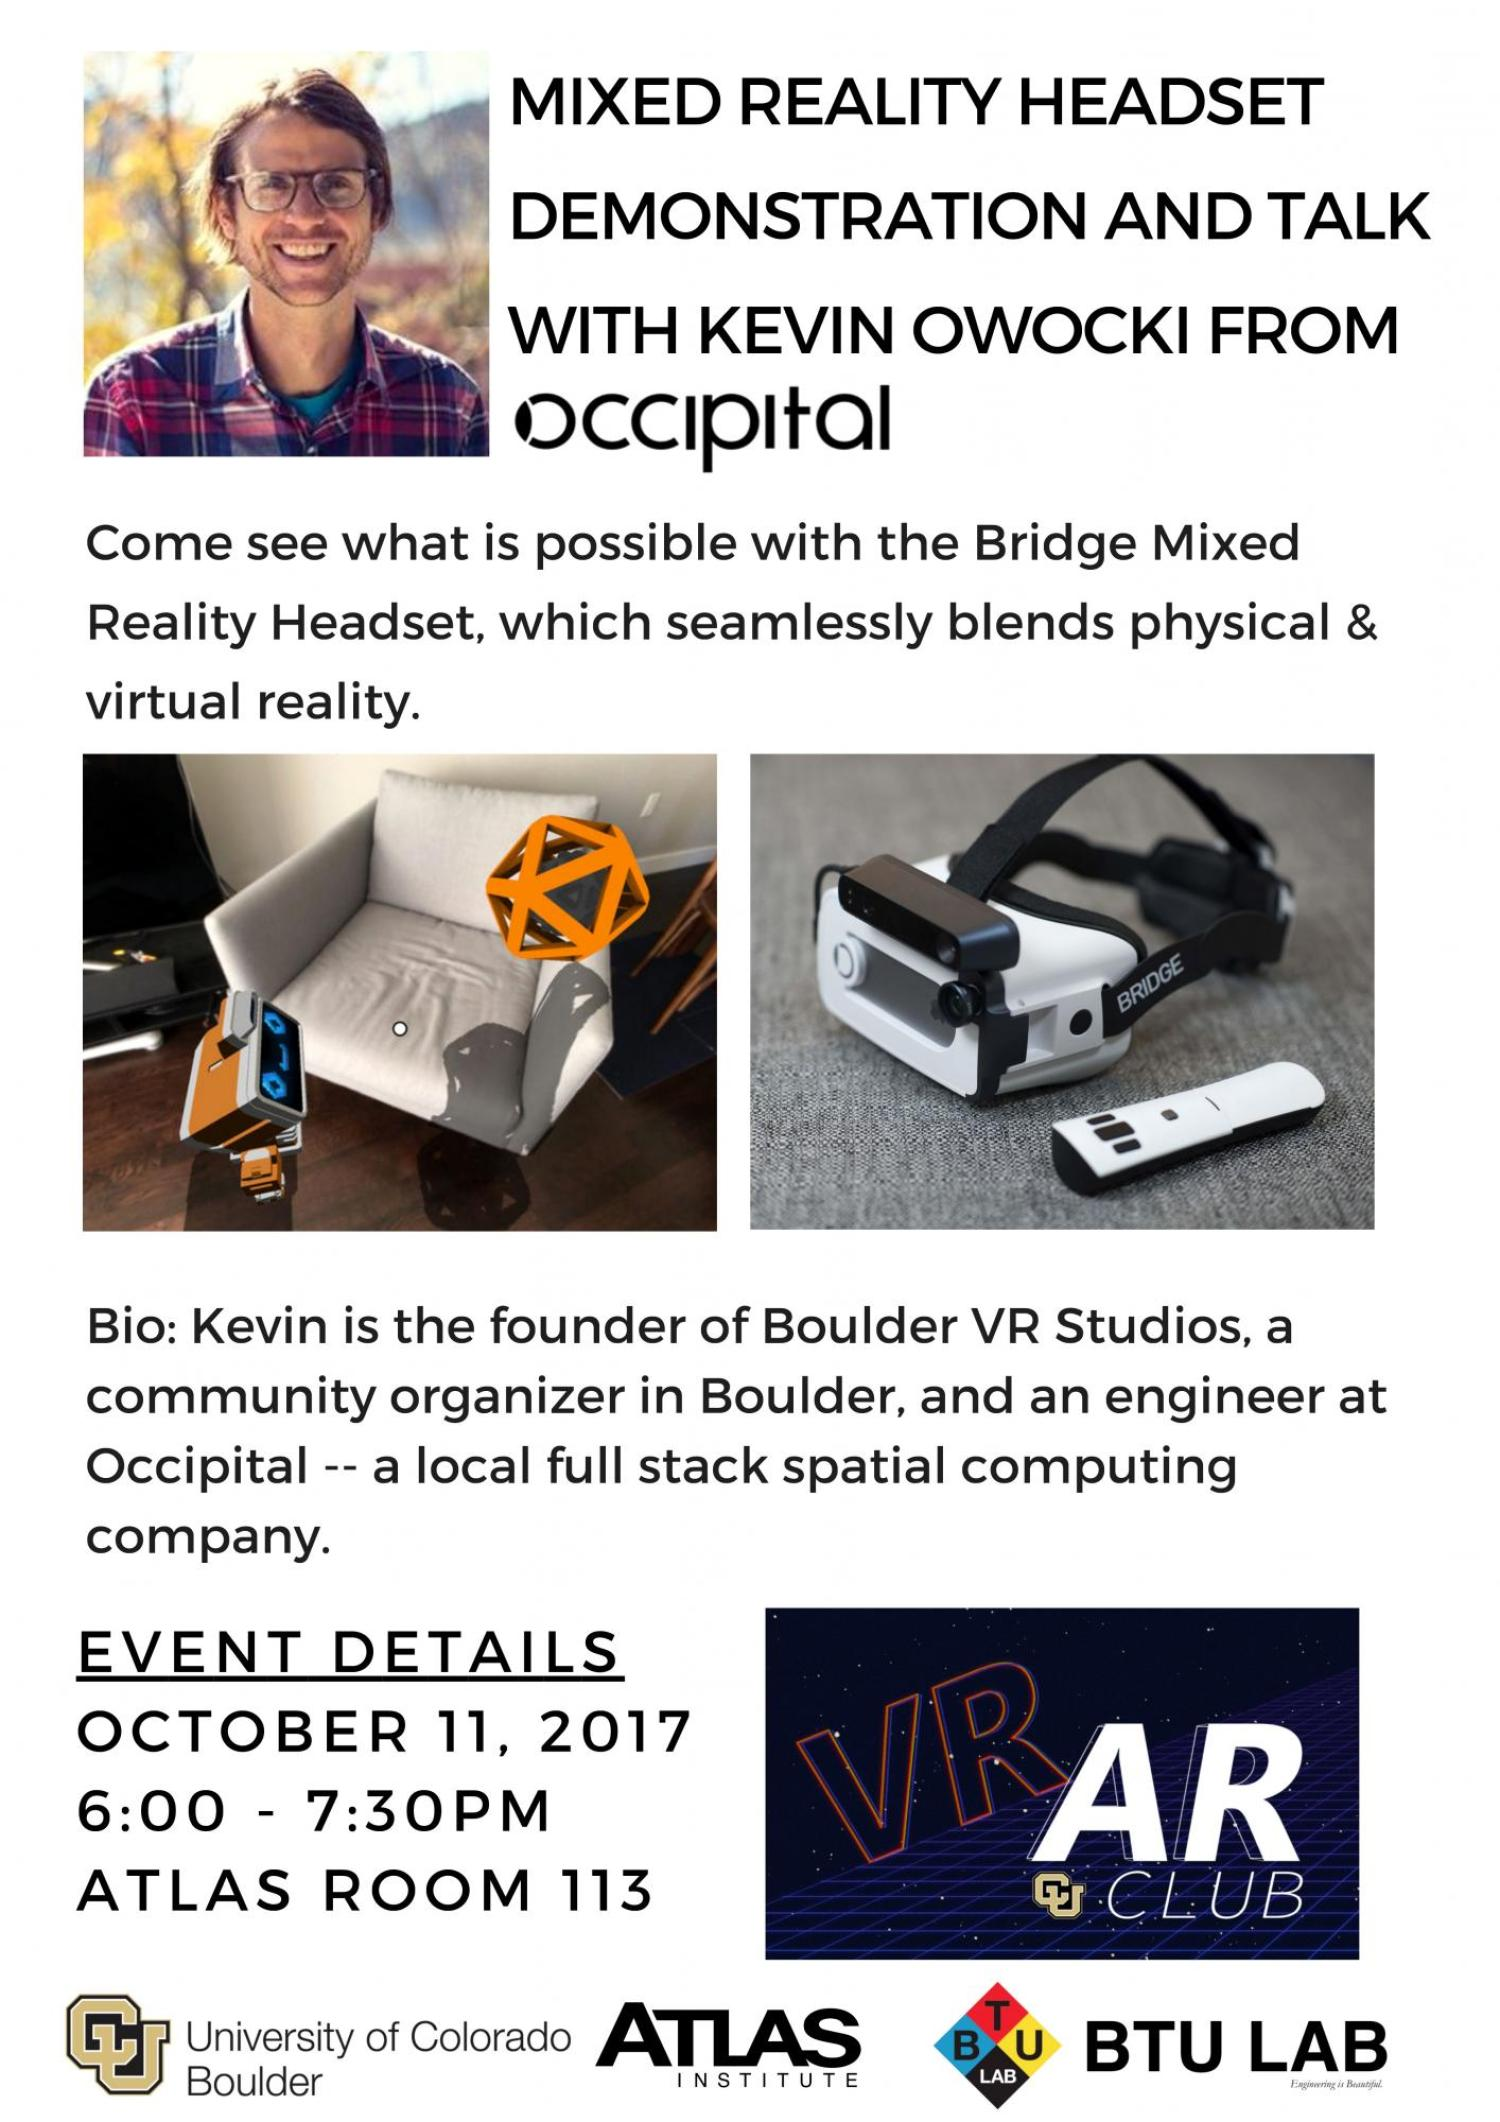 Occipital Kevin Owocki talk